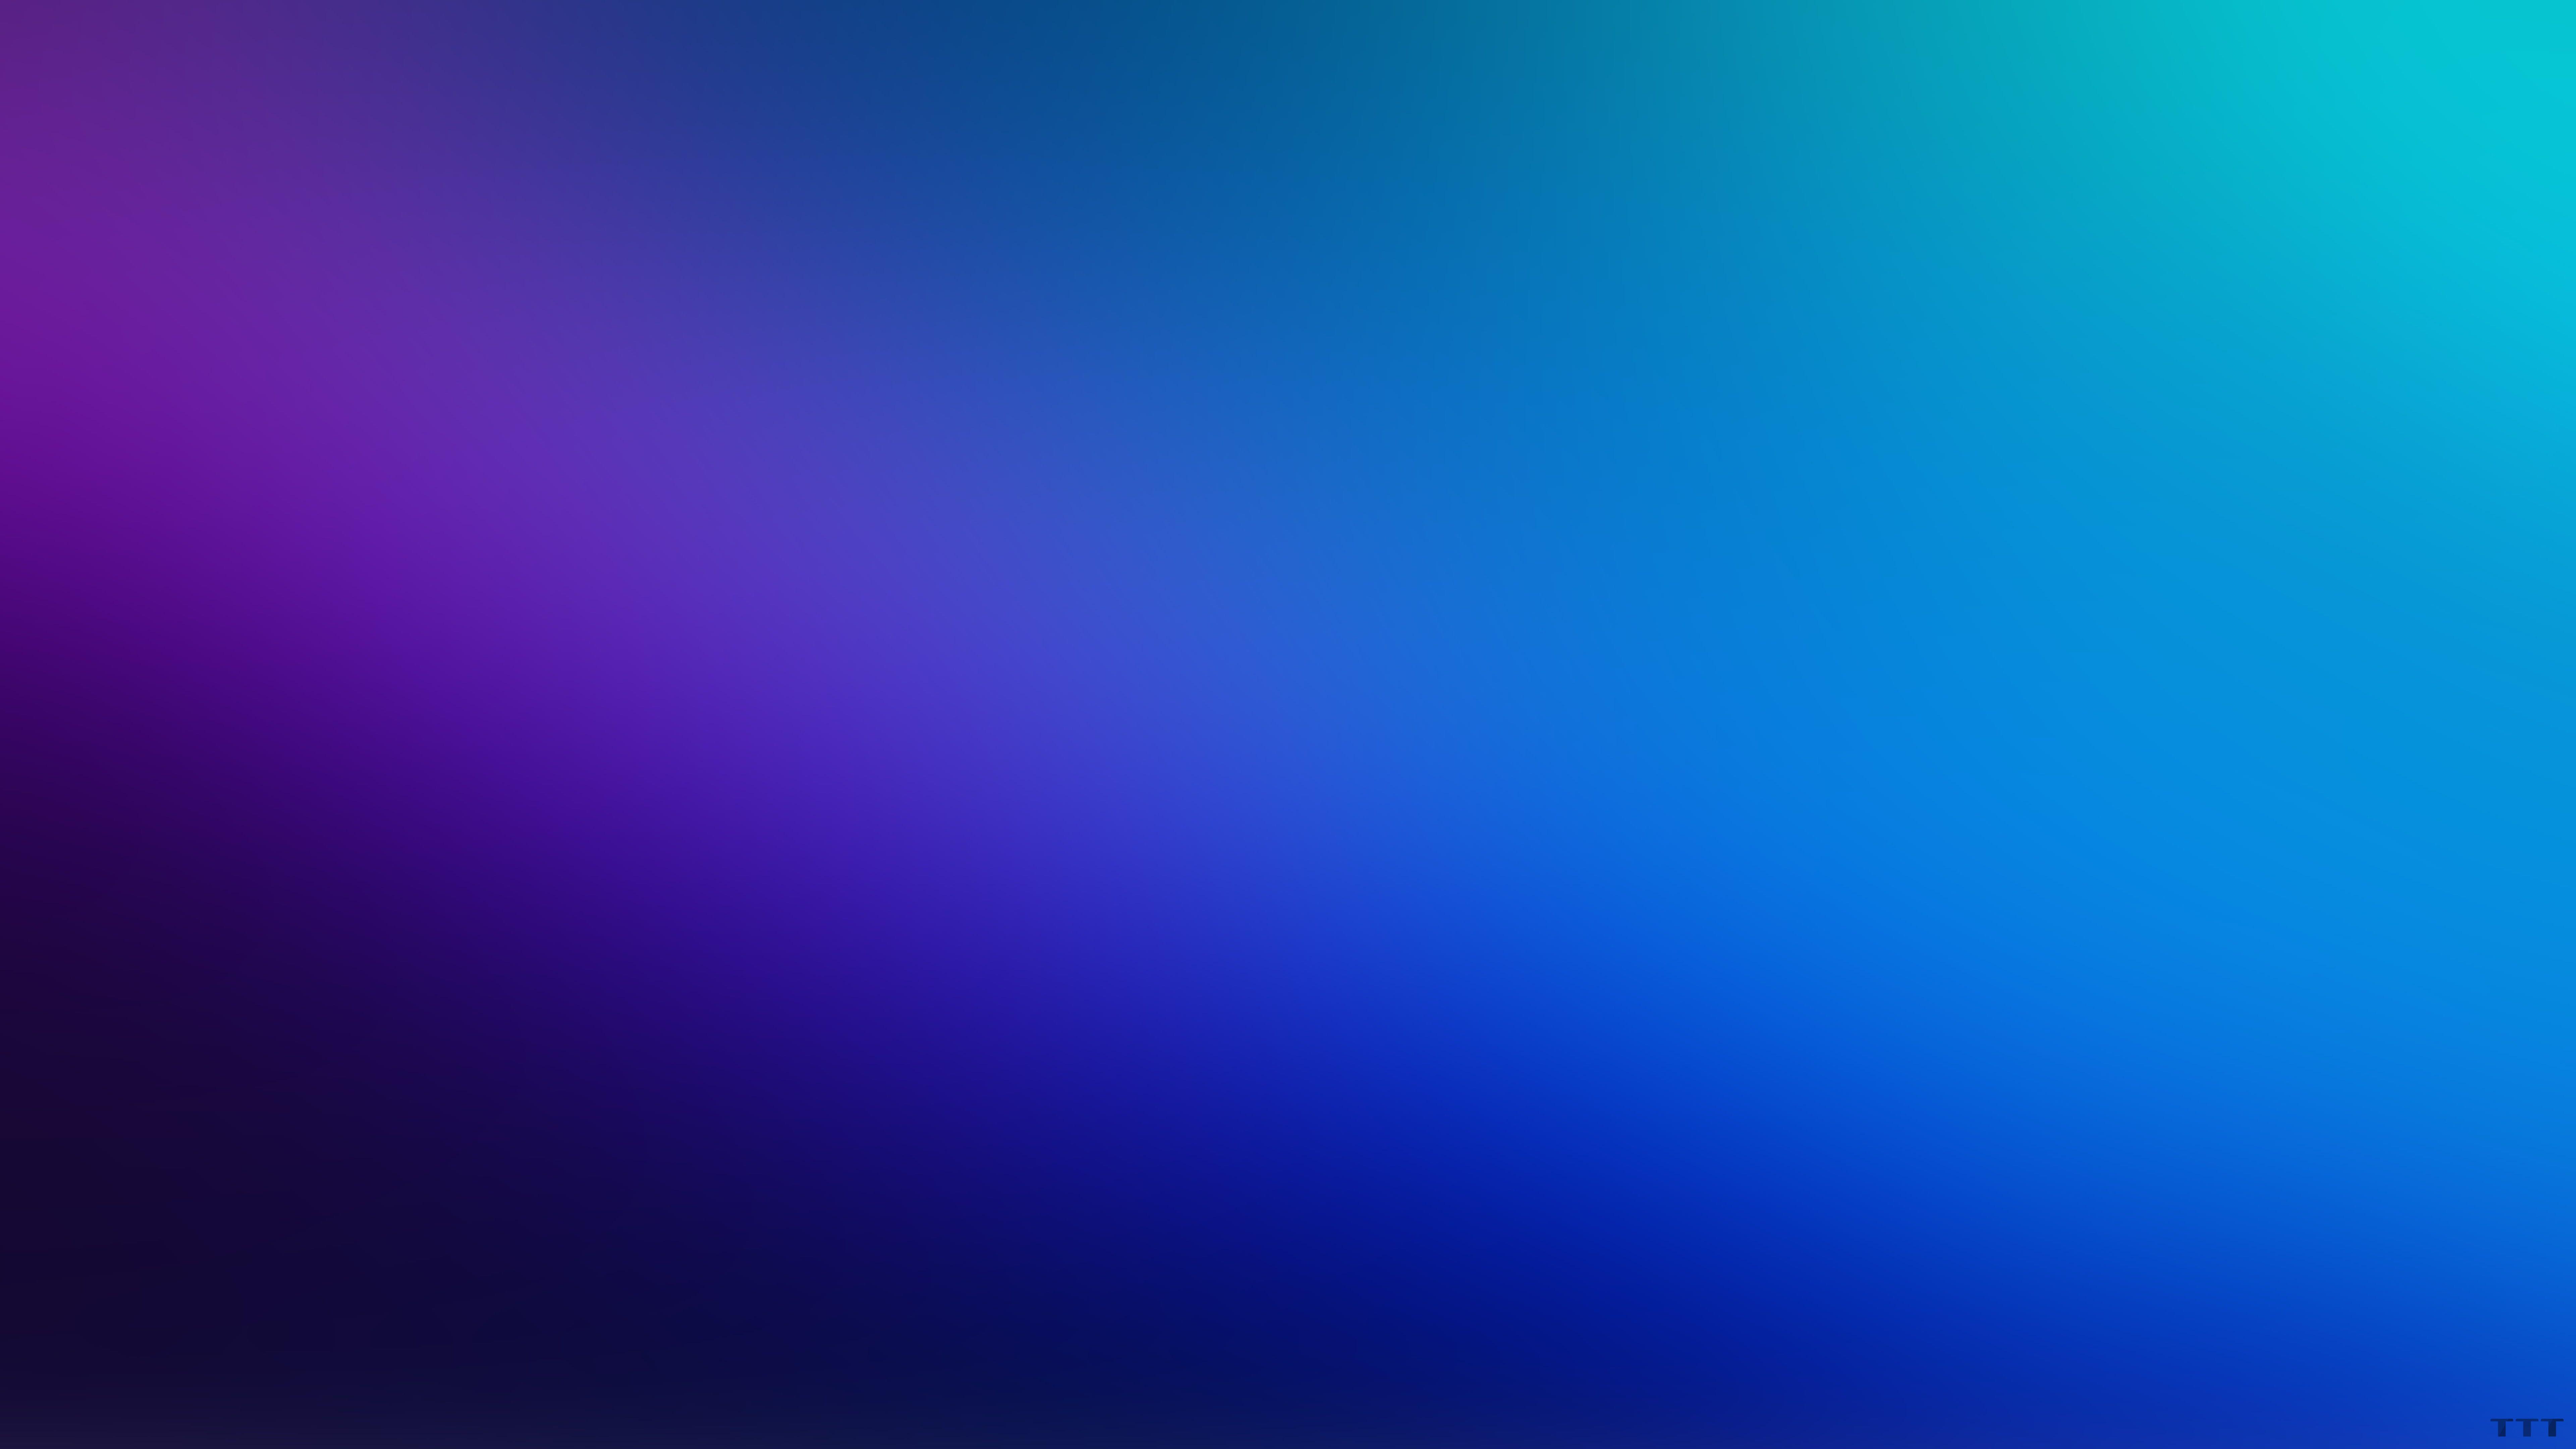 Blue And Purple Wallpaper Gradient Green Blue Violet 8k Wallpaper Hdwallpaper Desktop Yellow Aesthetic Pastel Blue Aesthetic Pastel Wallpapers Vintage